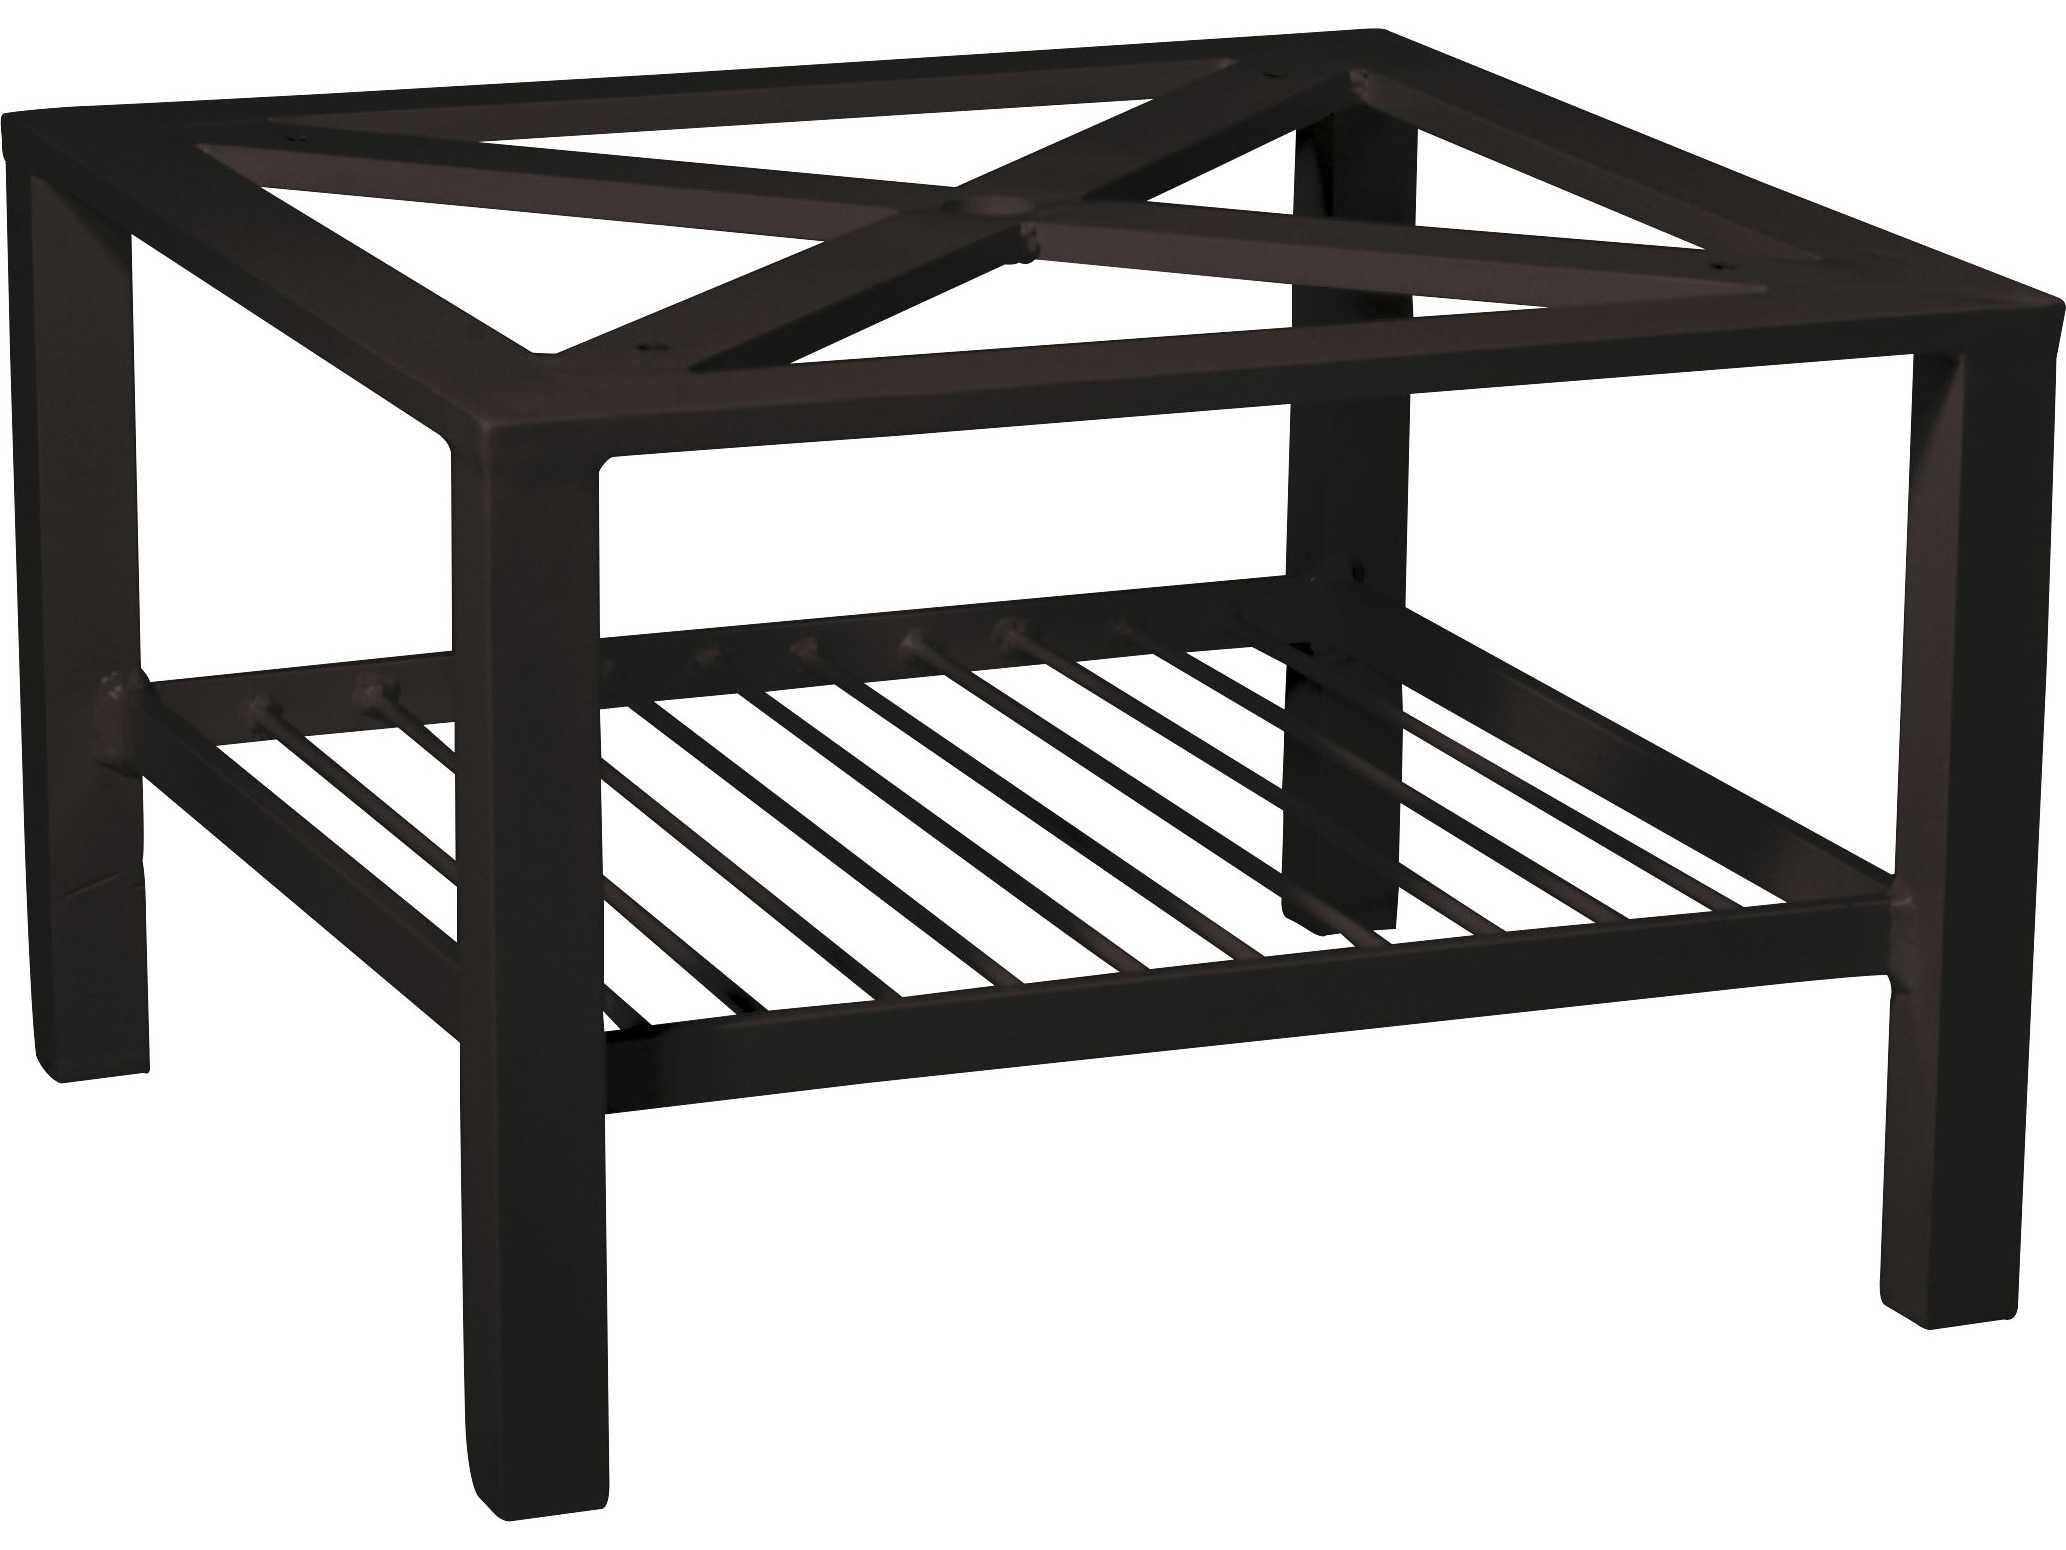 Woodard elite aluminum coffee table base only wr4v4300 for Coffee table base only